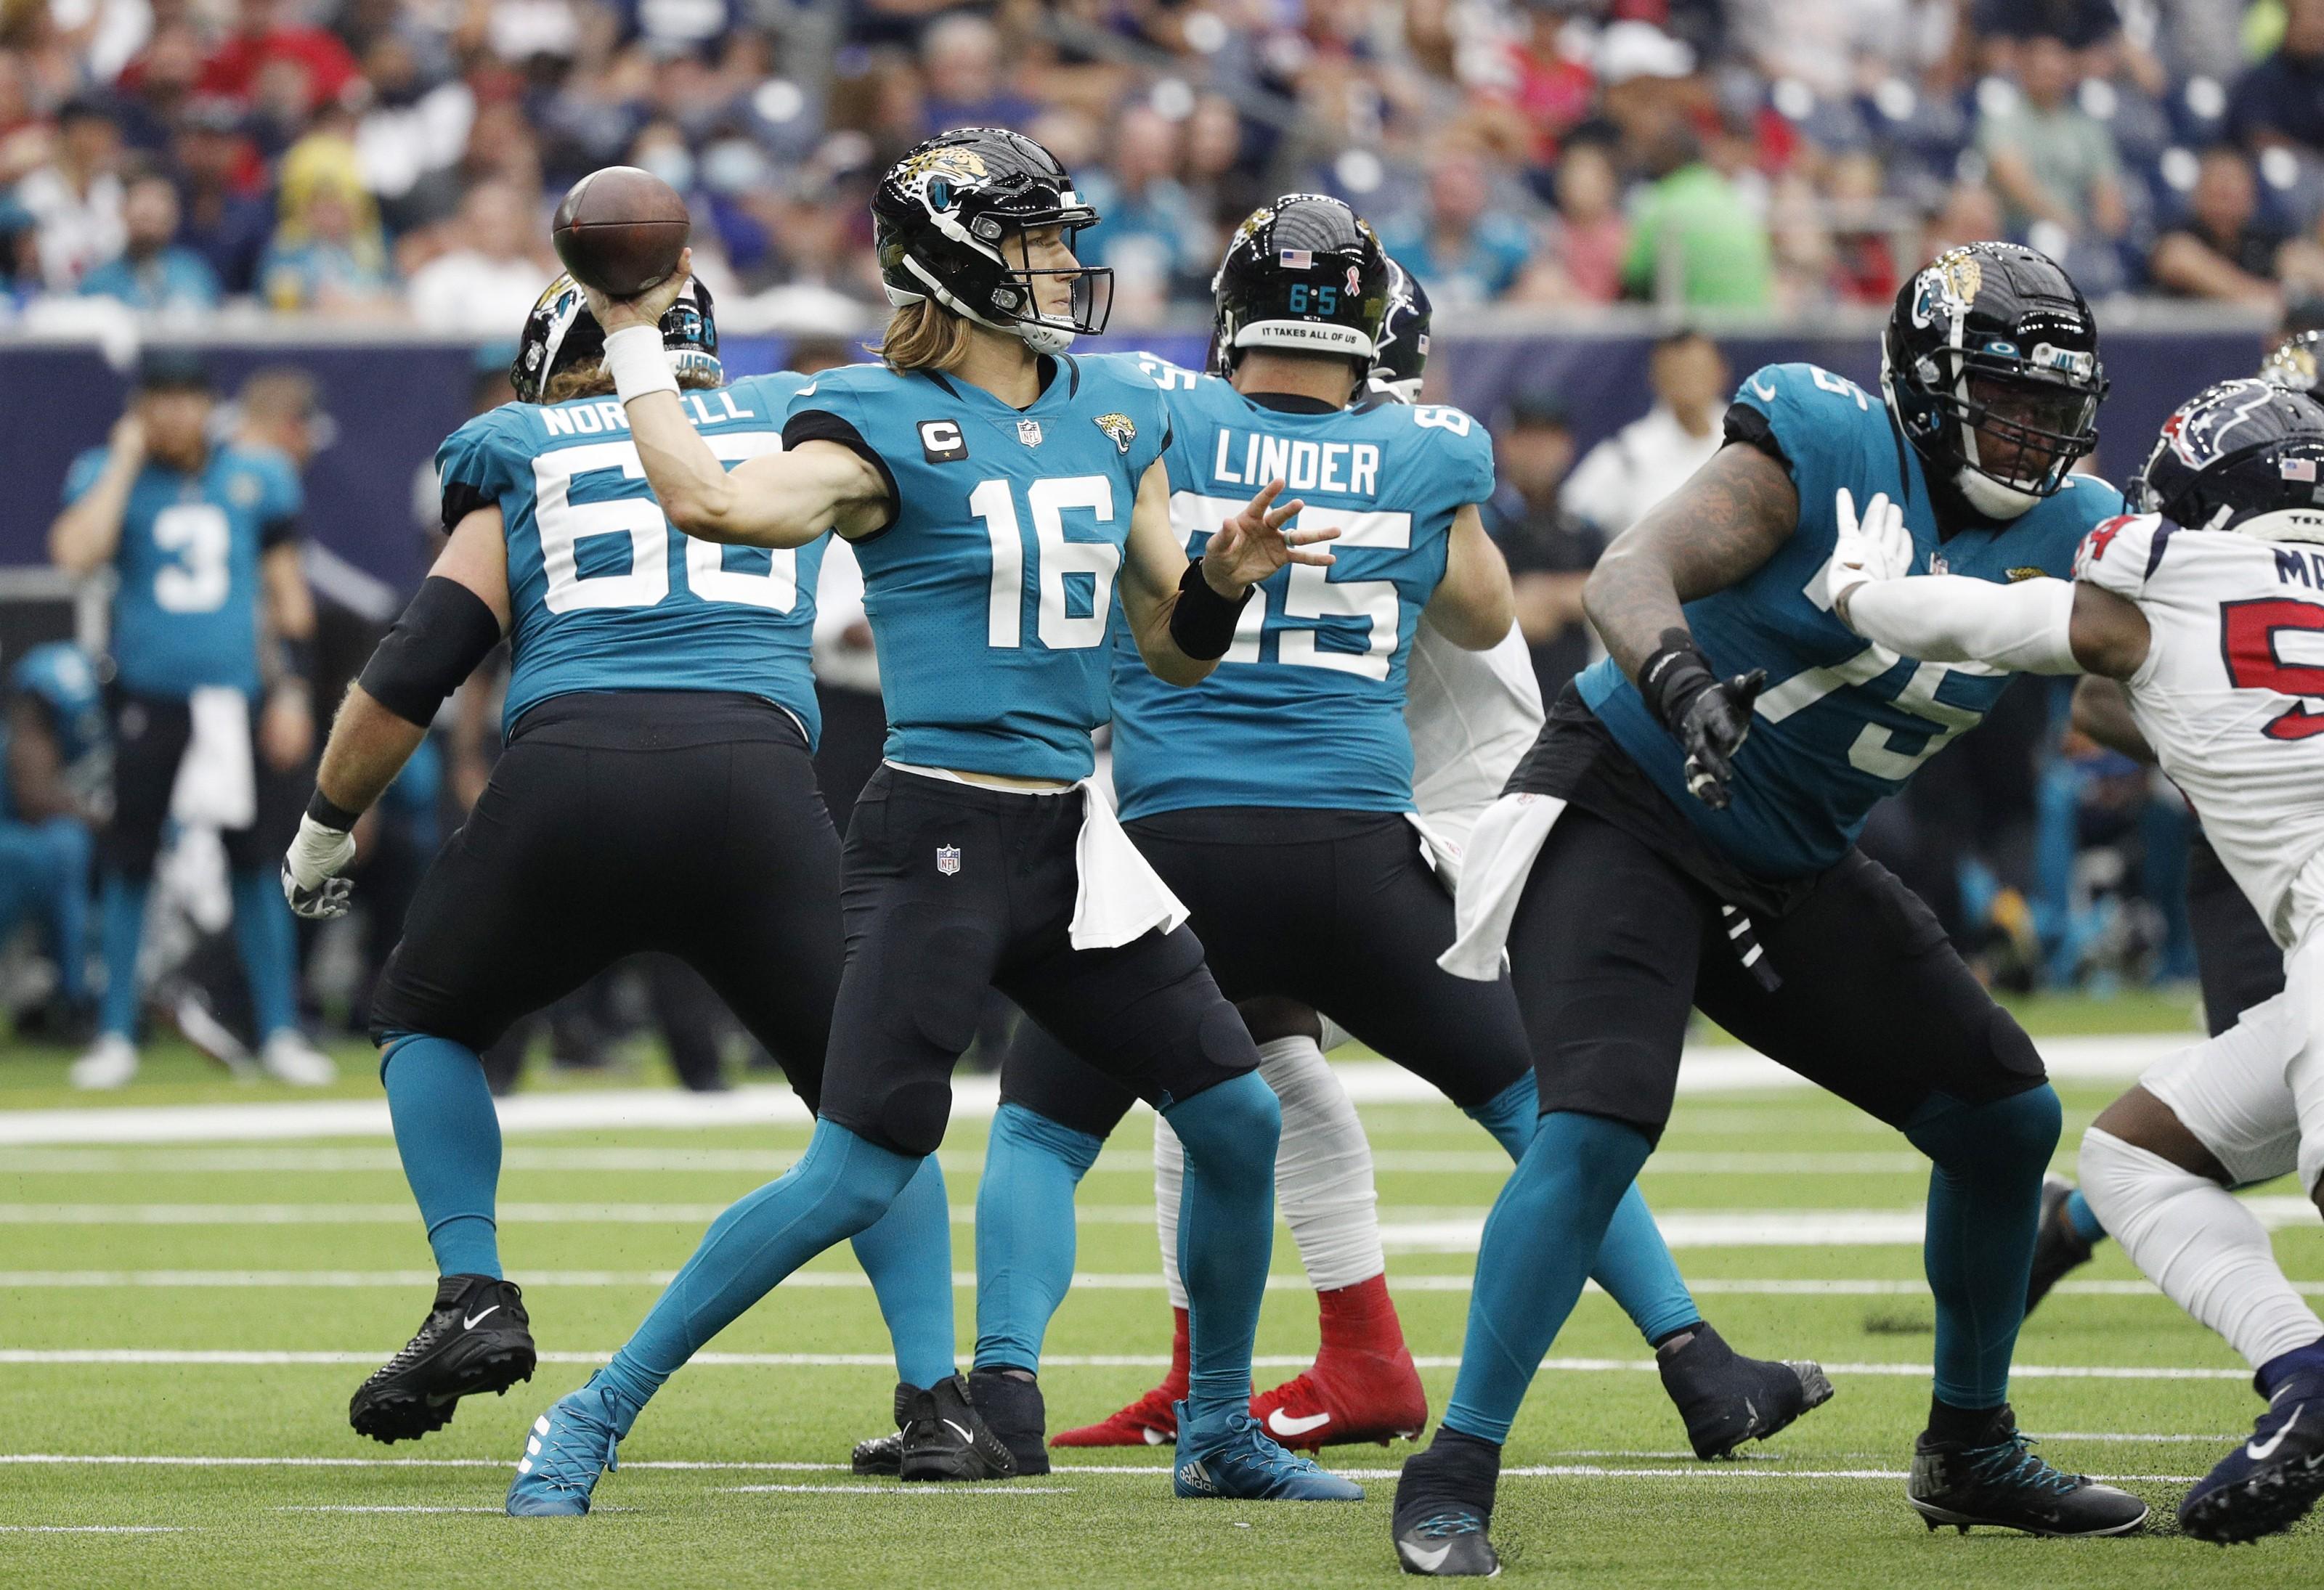 NFL Week 2 Home Dogs Dolphins, Ravens, Jets, Jags, Panthers, Colts, Eagles, Jaguars